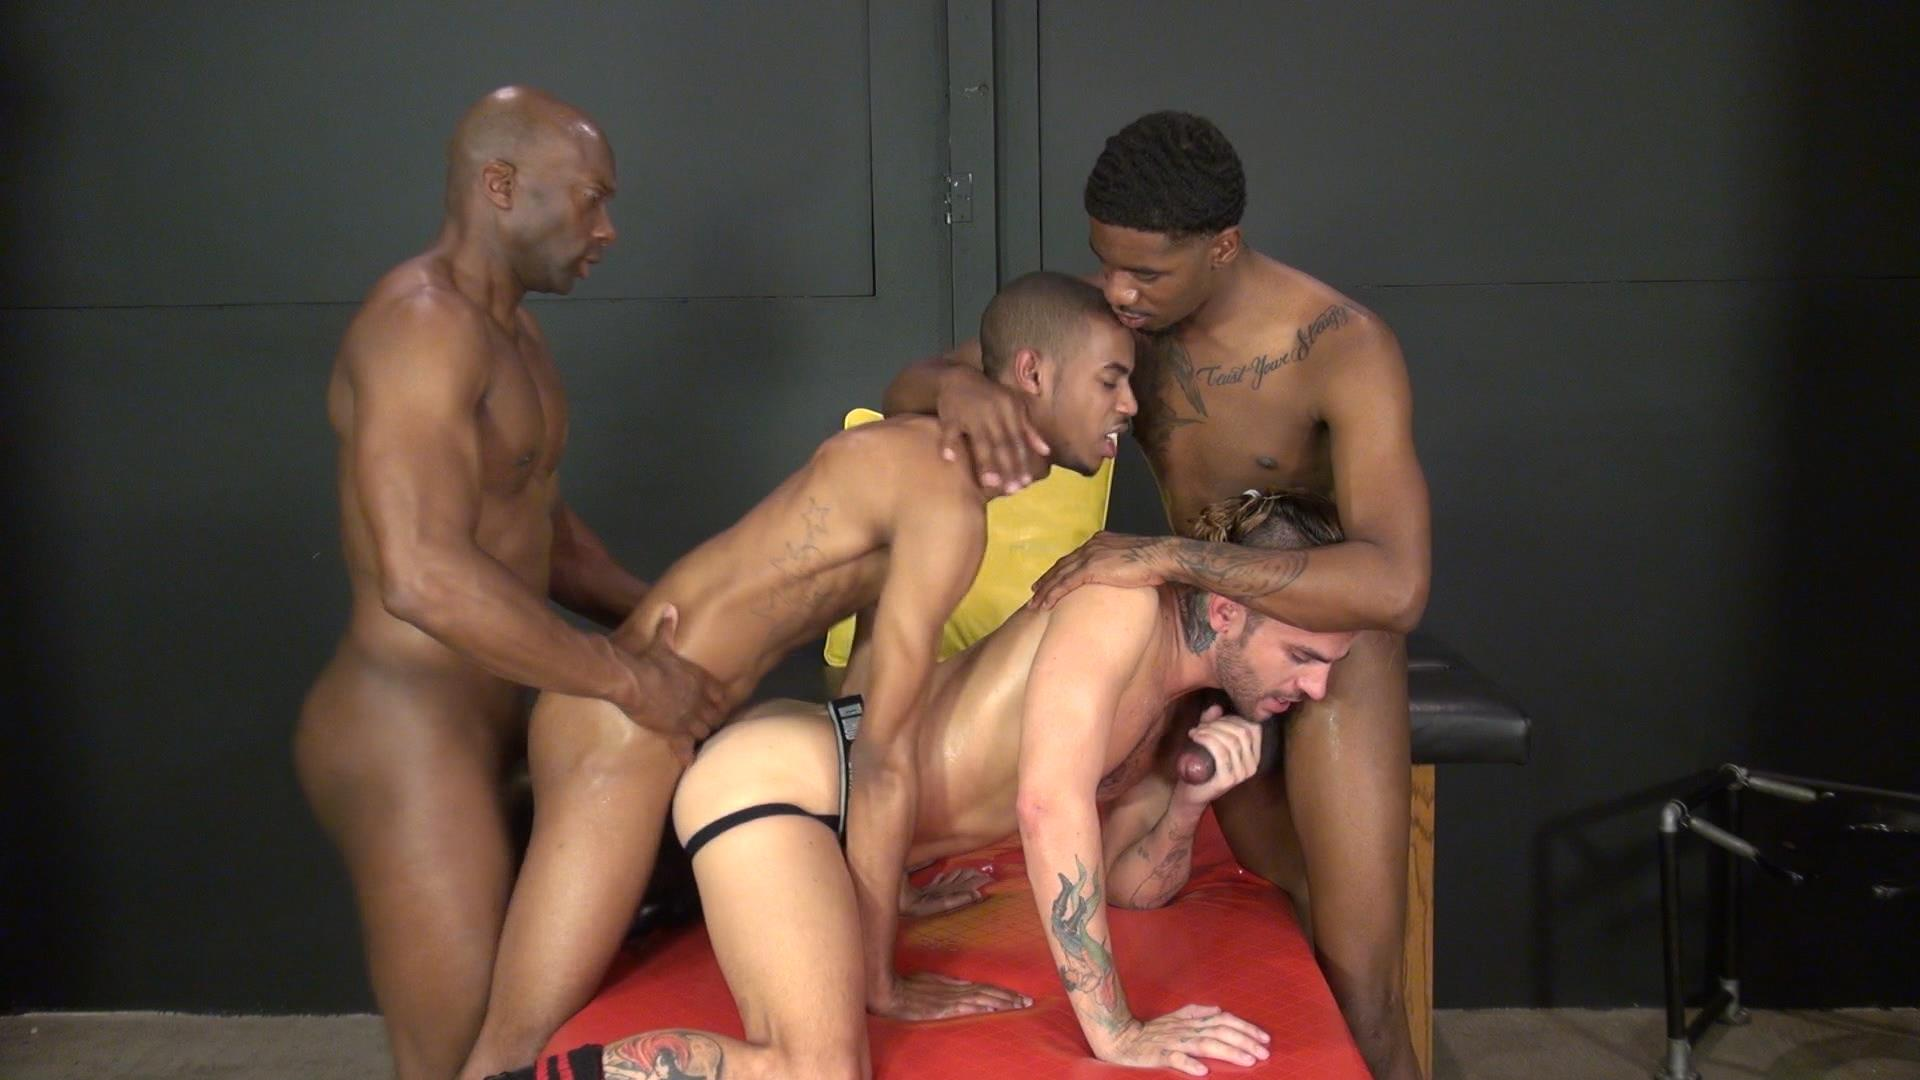 Adam Champ Carlo Masi Gay Porn Free Videos adam champ gay porn star - megapornx